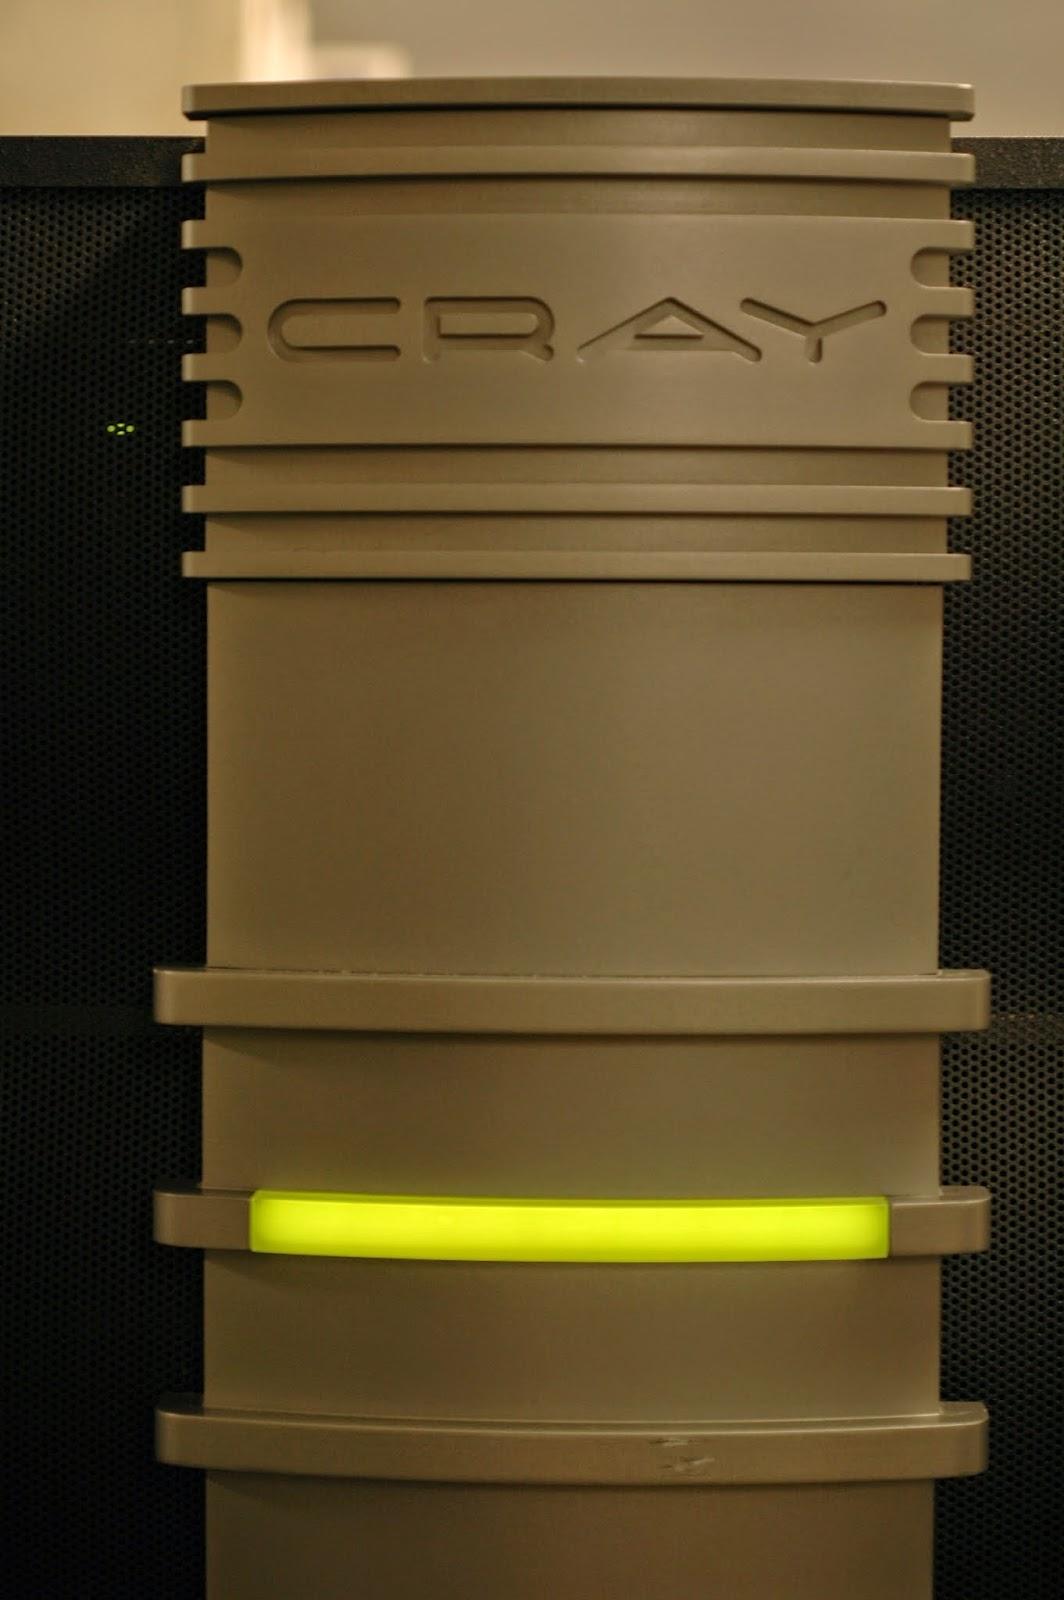 Cray J916